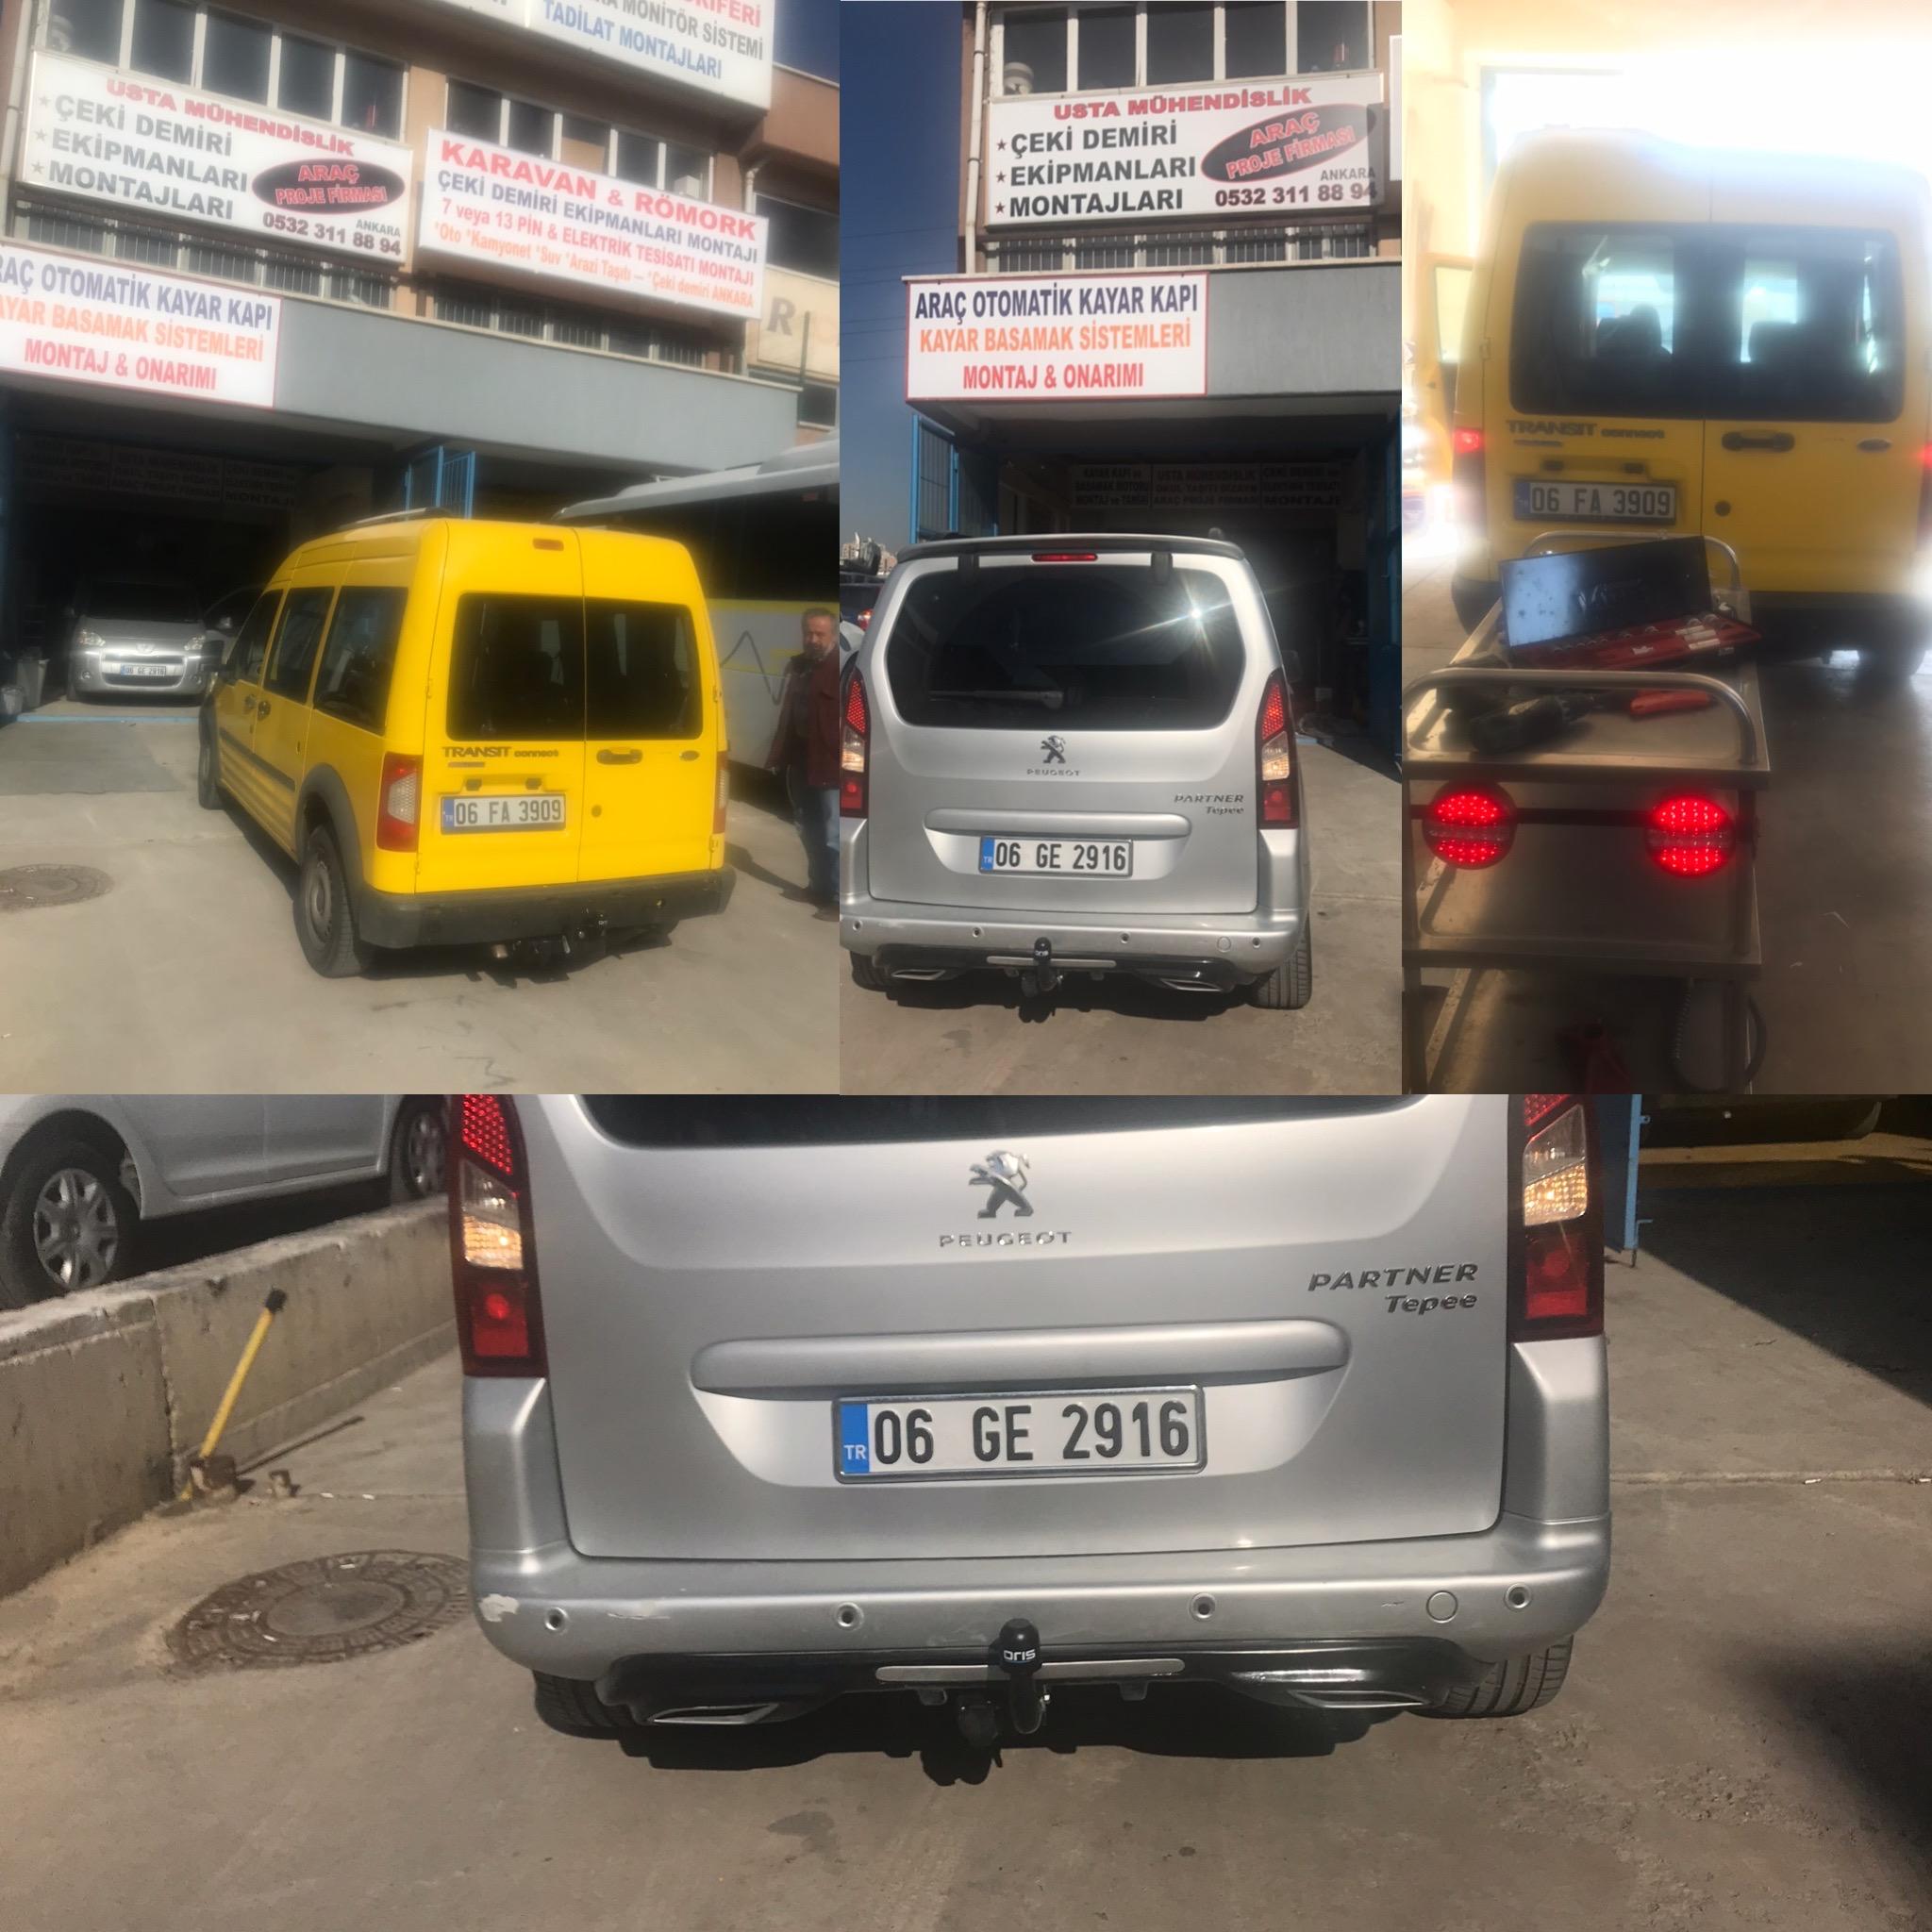 ÇEKİ DEMİRİ OSTİM ANKARA 017